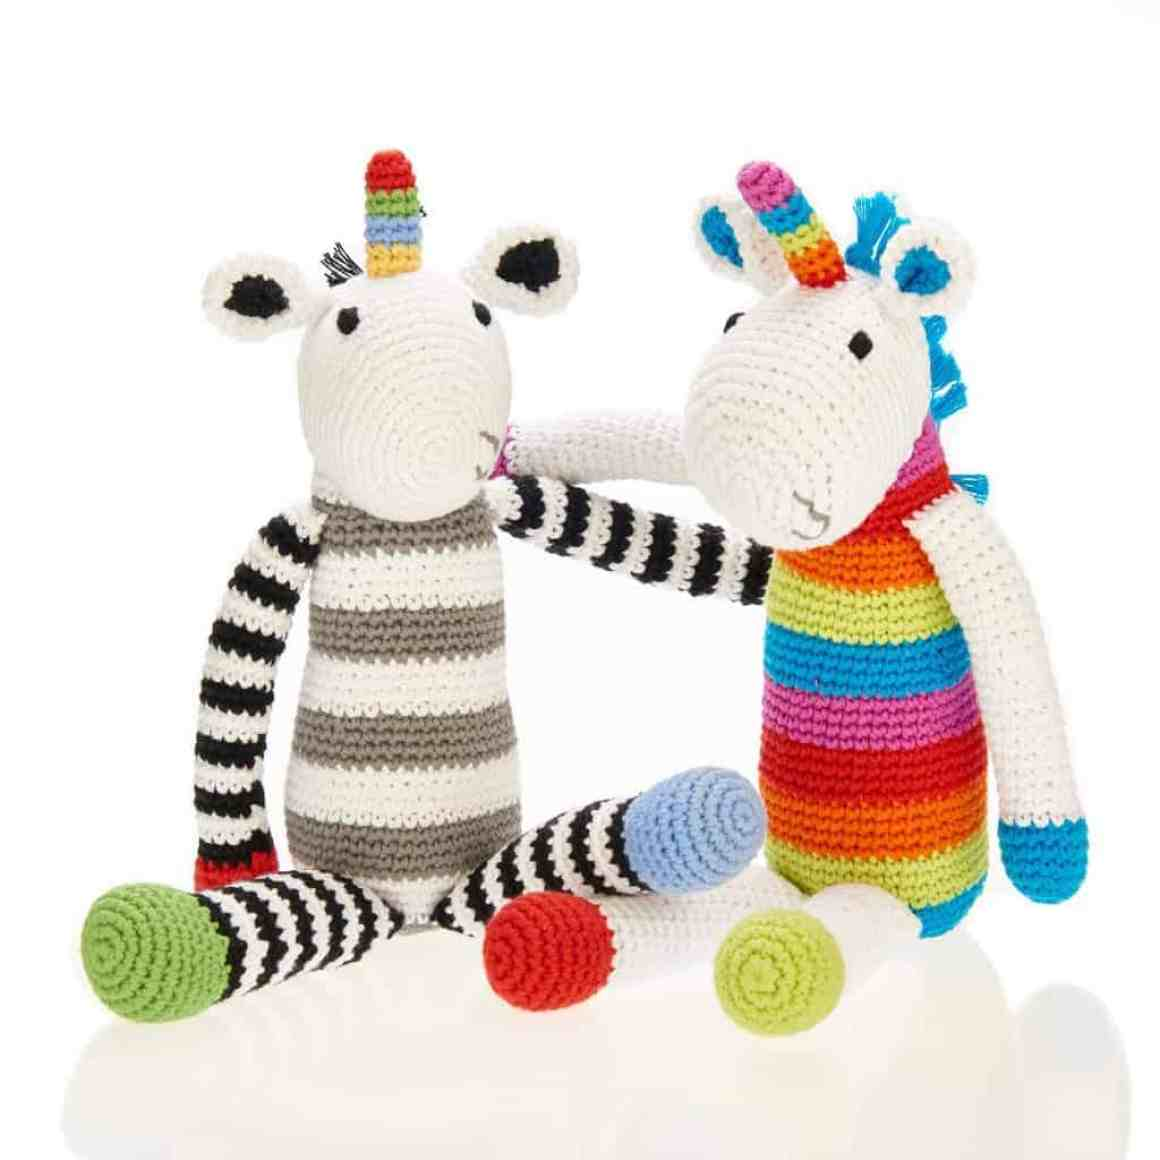 Unicorn Knitted Toys